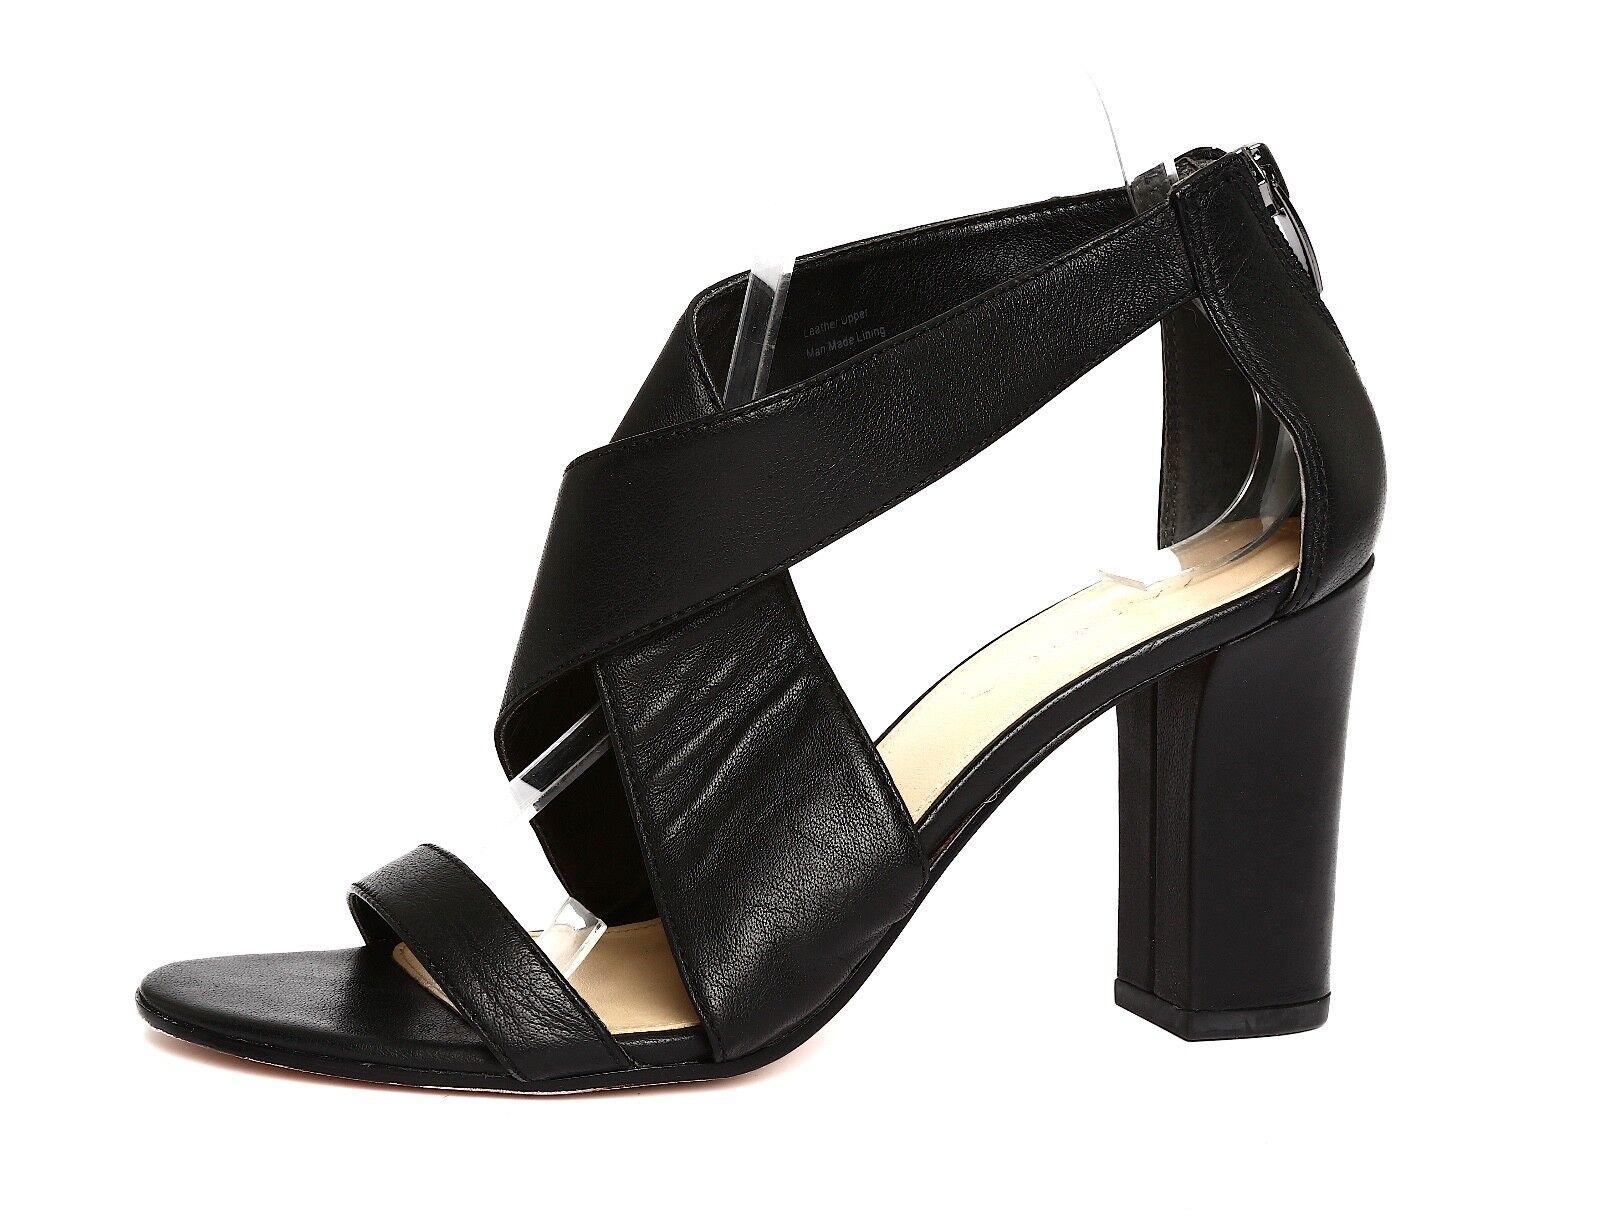 Via Spiga 7.5M Donna Nero Pelle High Heel Sandals Sz 7.5M Spiga 1349 29b07e